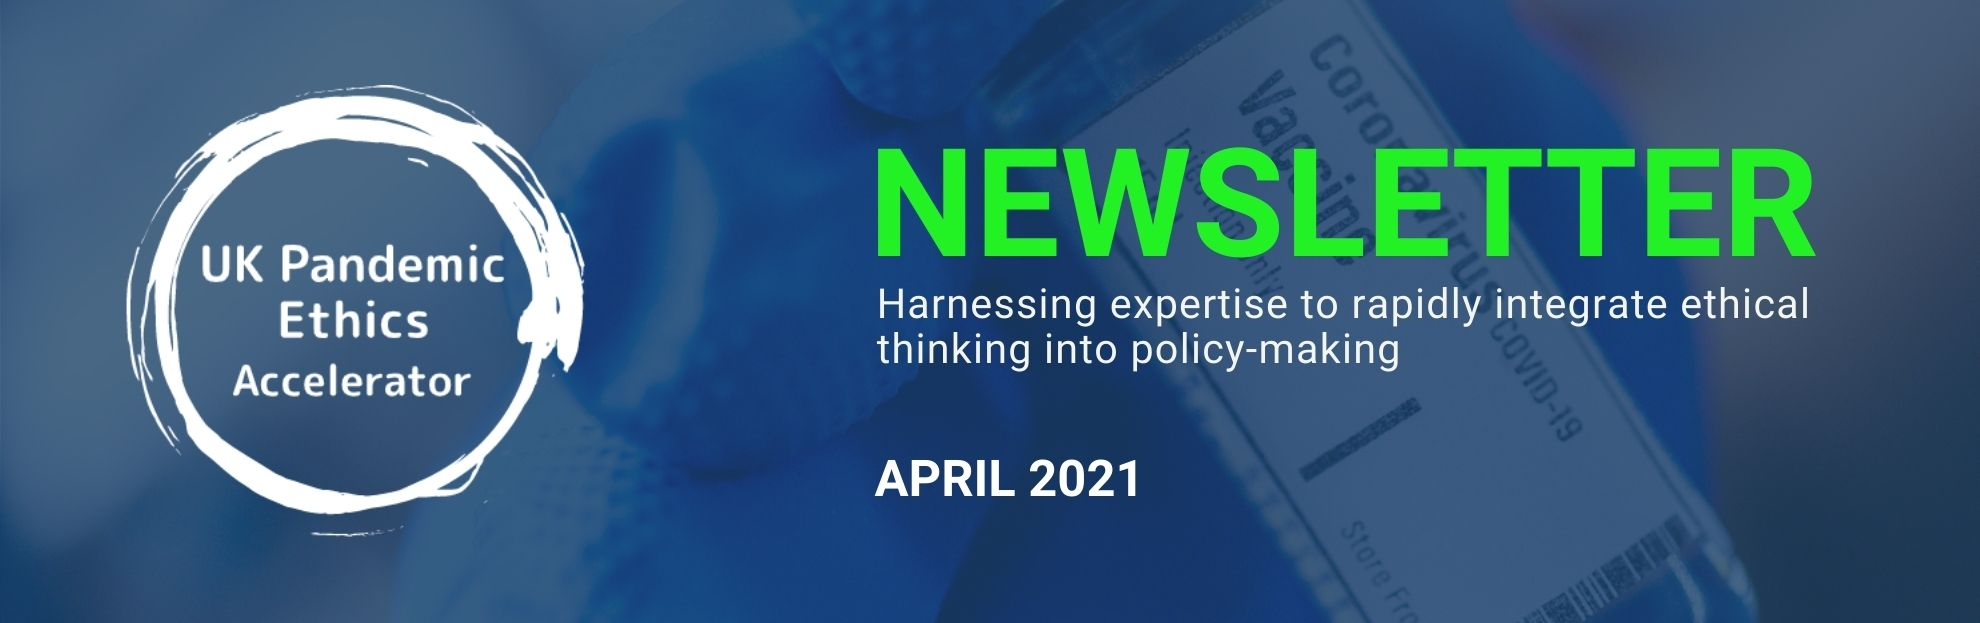 Blue banner image showing the UK Pandemic Ethics logo alongside the heading Newsletter April 2021